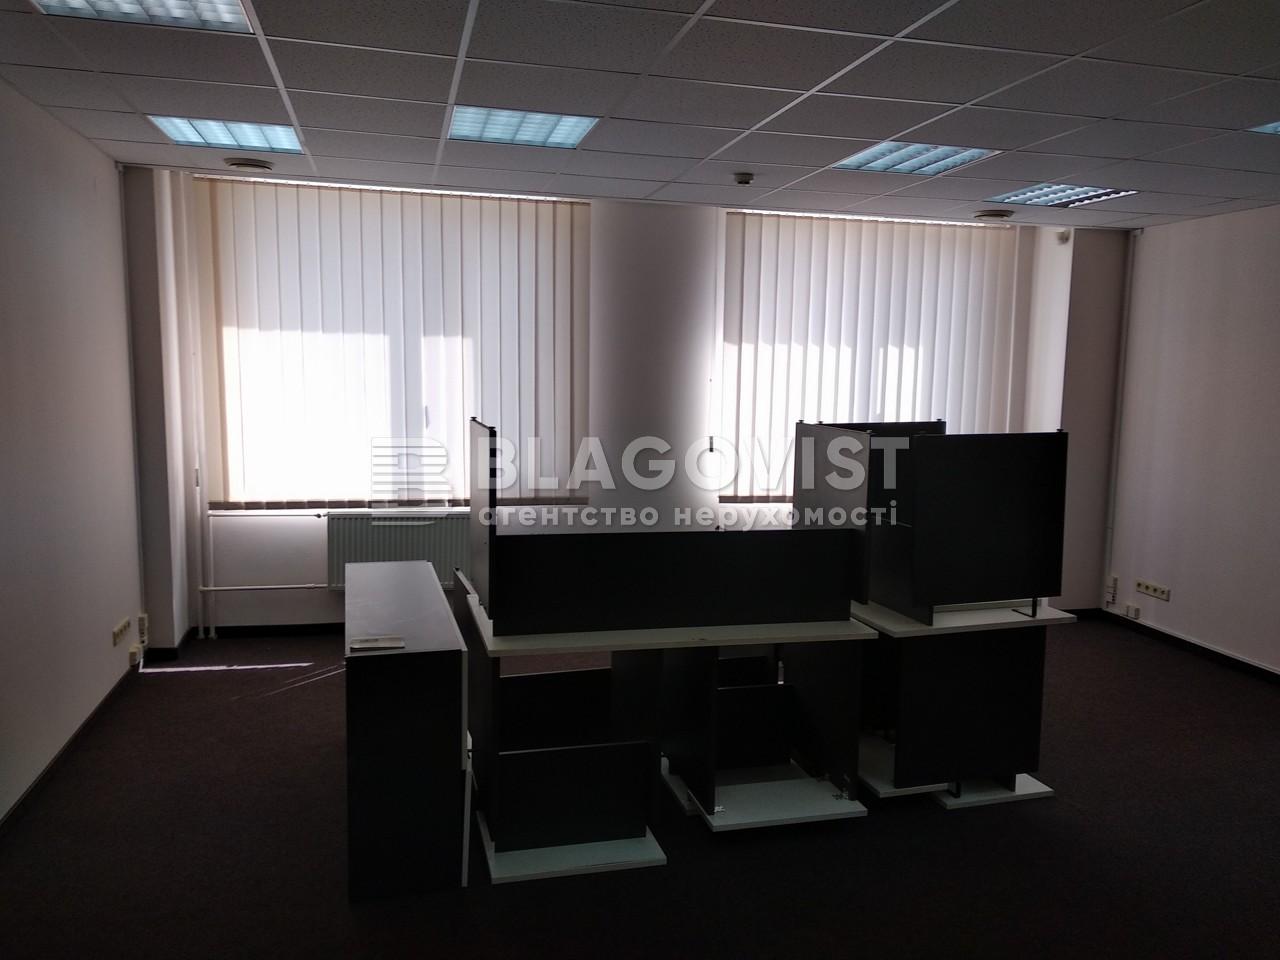 Офис, Гайдара, Киев, E-6932 - Фото 8